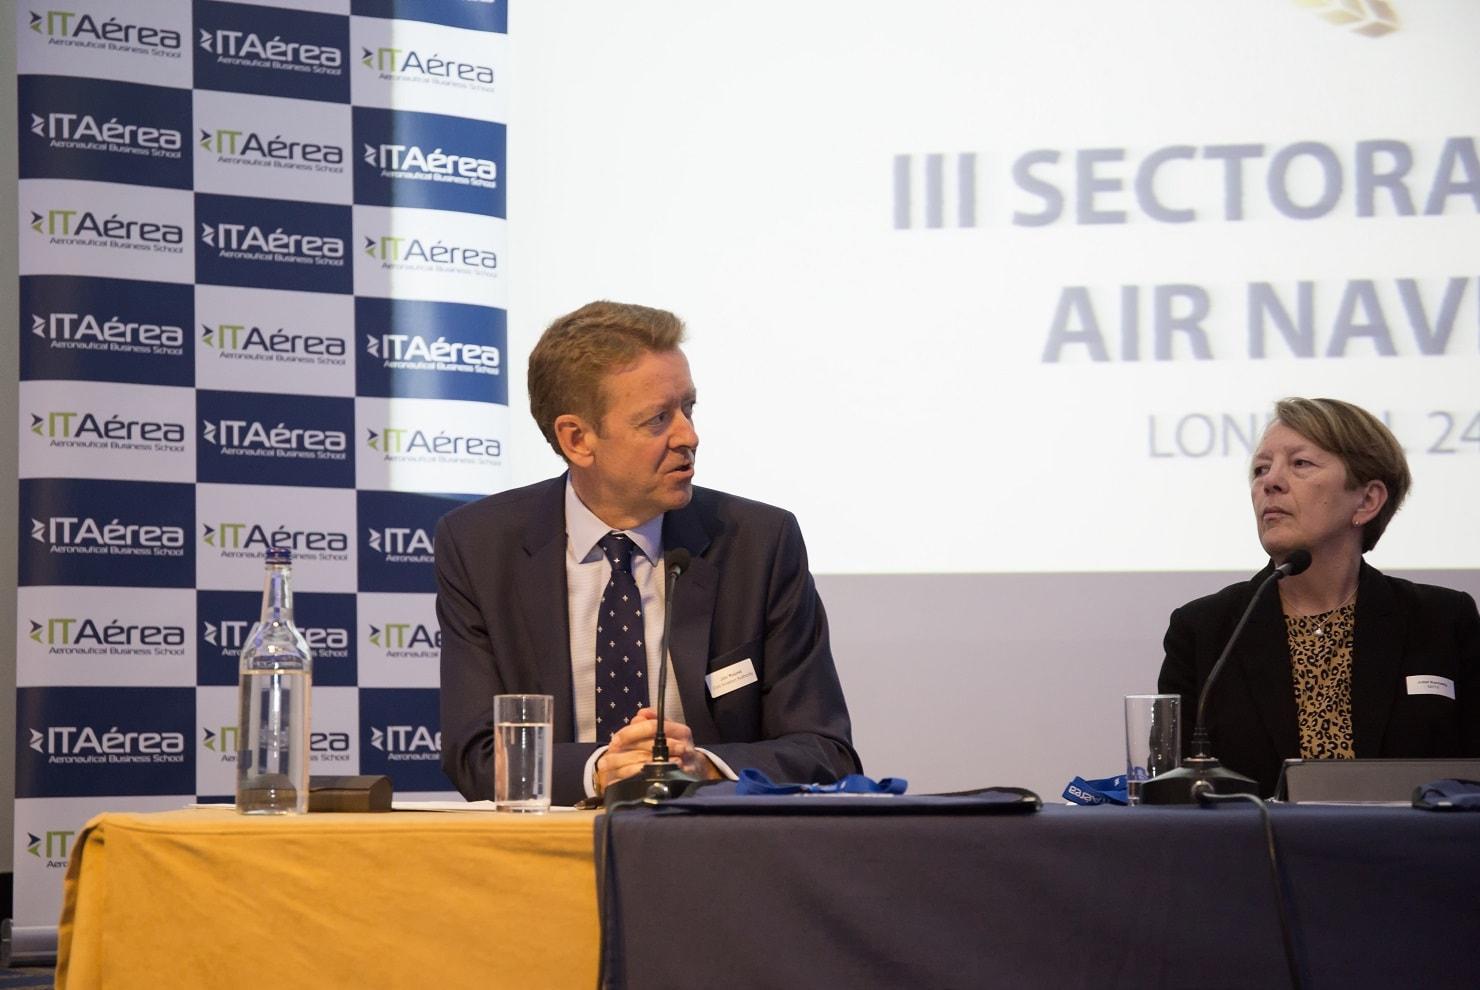 16 min - III Sector Meeting: Air Navigation